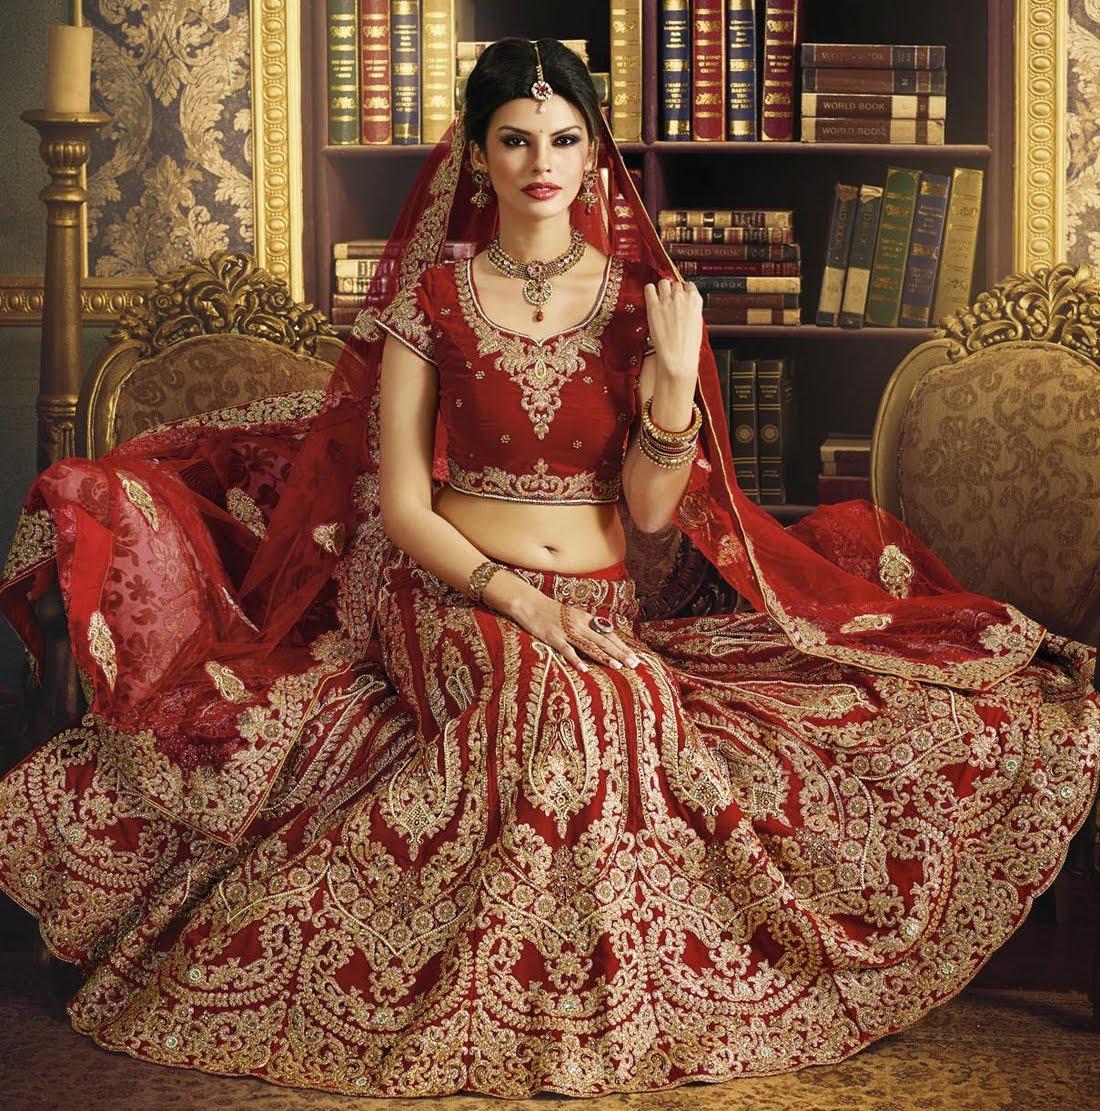 Lehenga- Where To Find Bridal Lehengas In Delhi